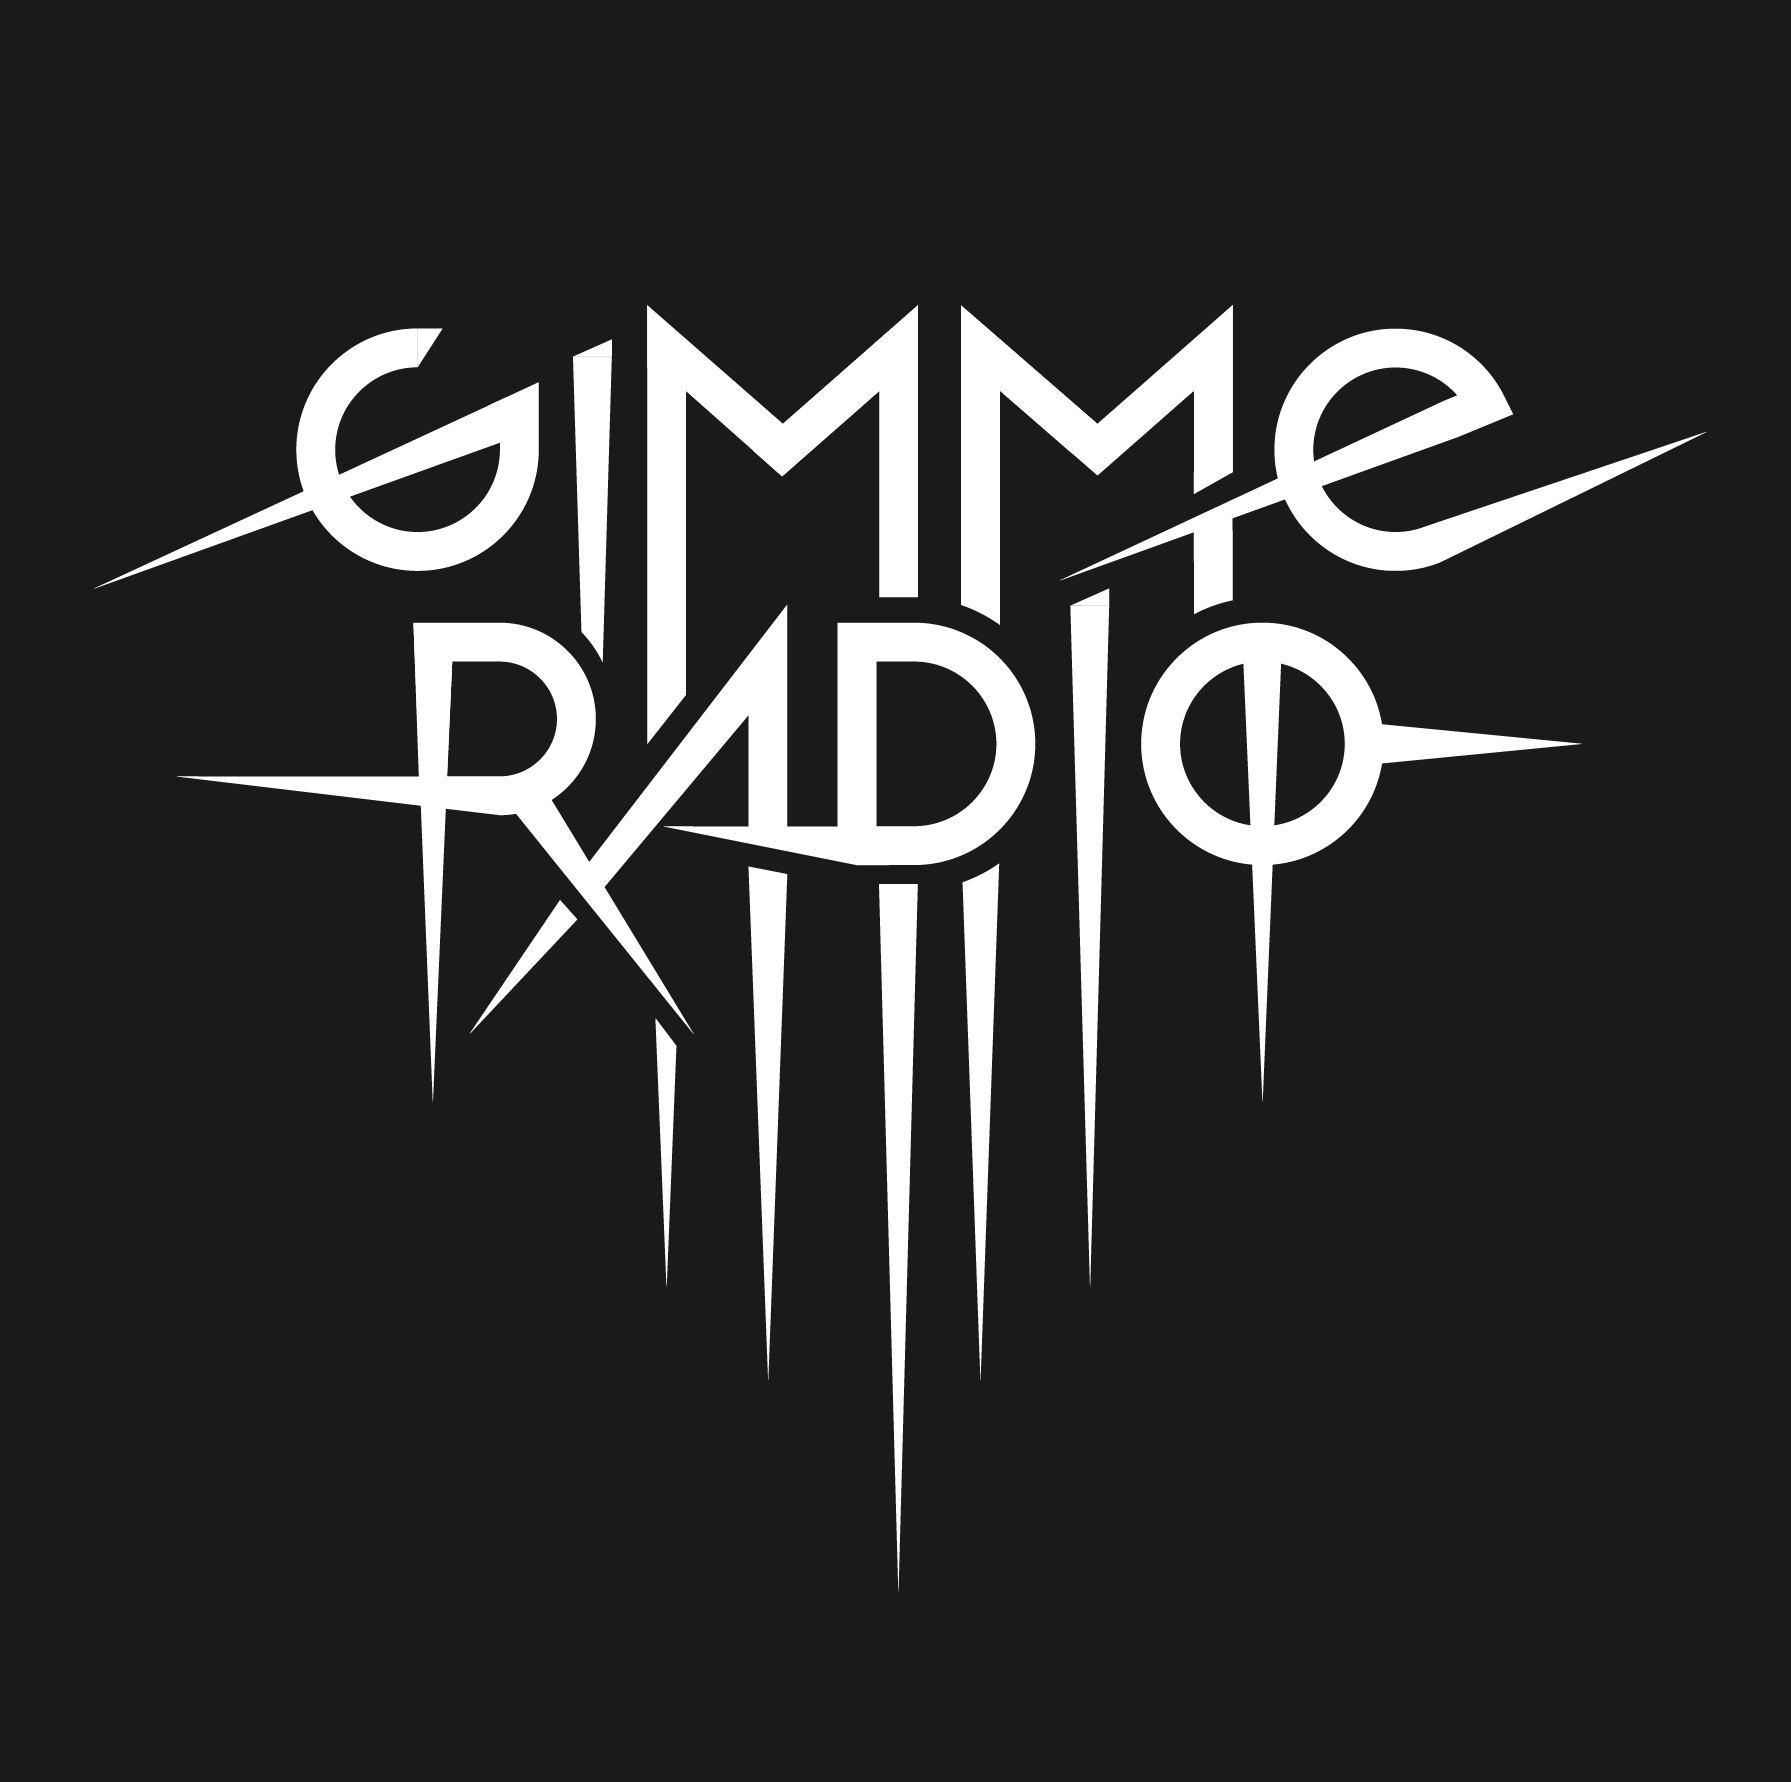 Gimme Radio - Wikipedia